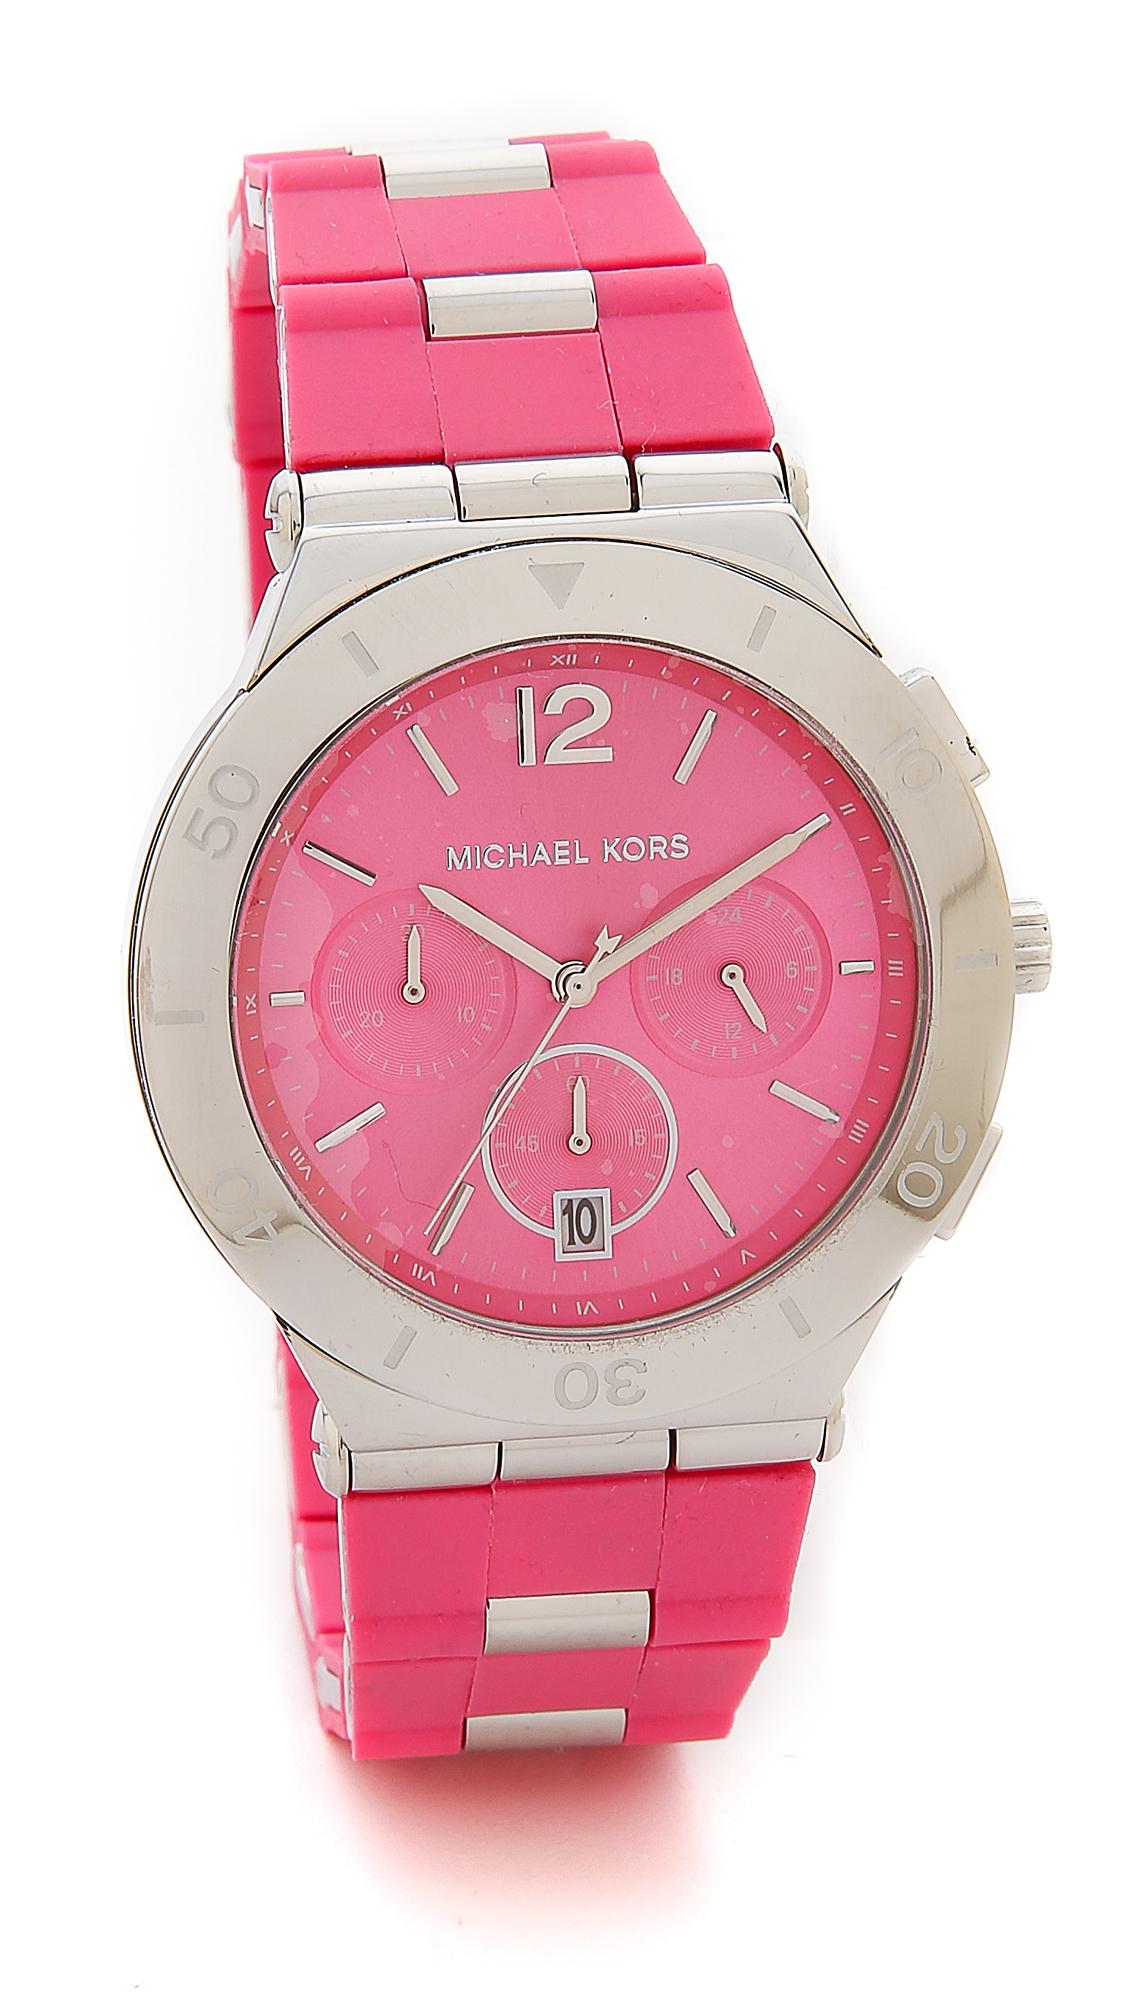 bfcbb530a1fa Michael Kors Wyatt Watch - Silver pink in Pink - Lyst